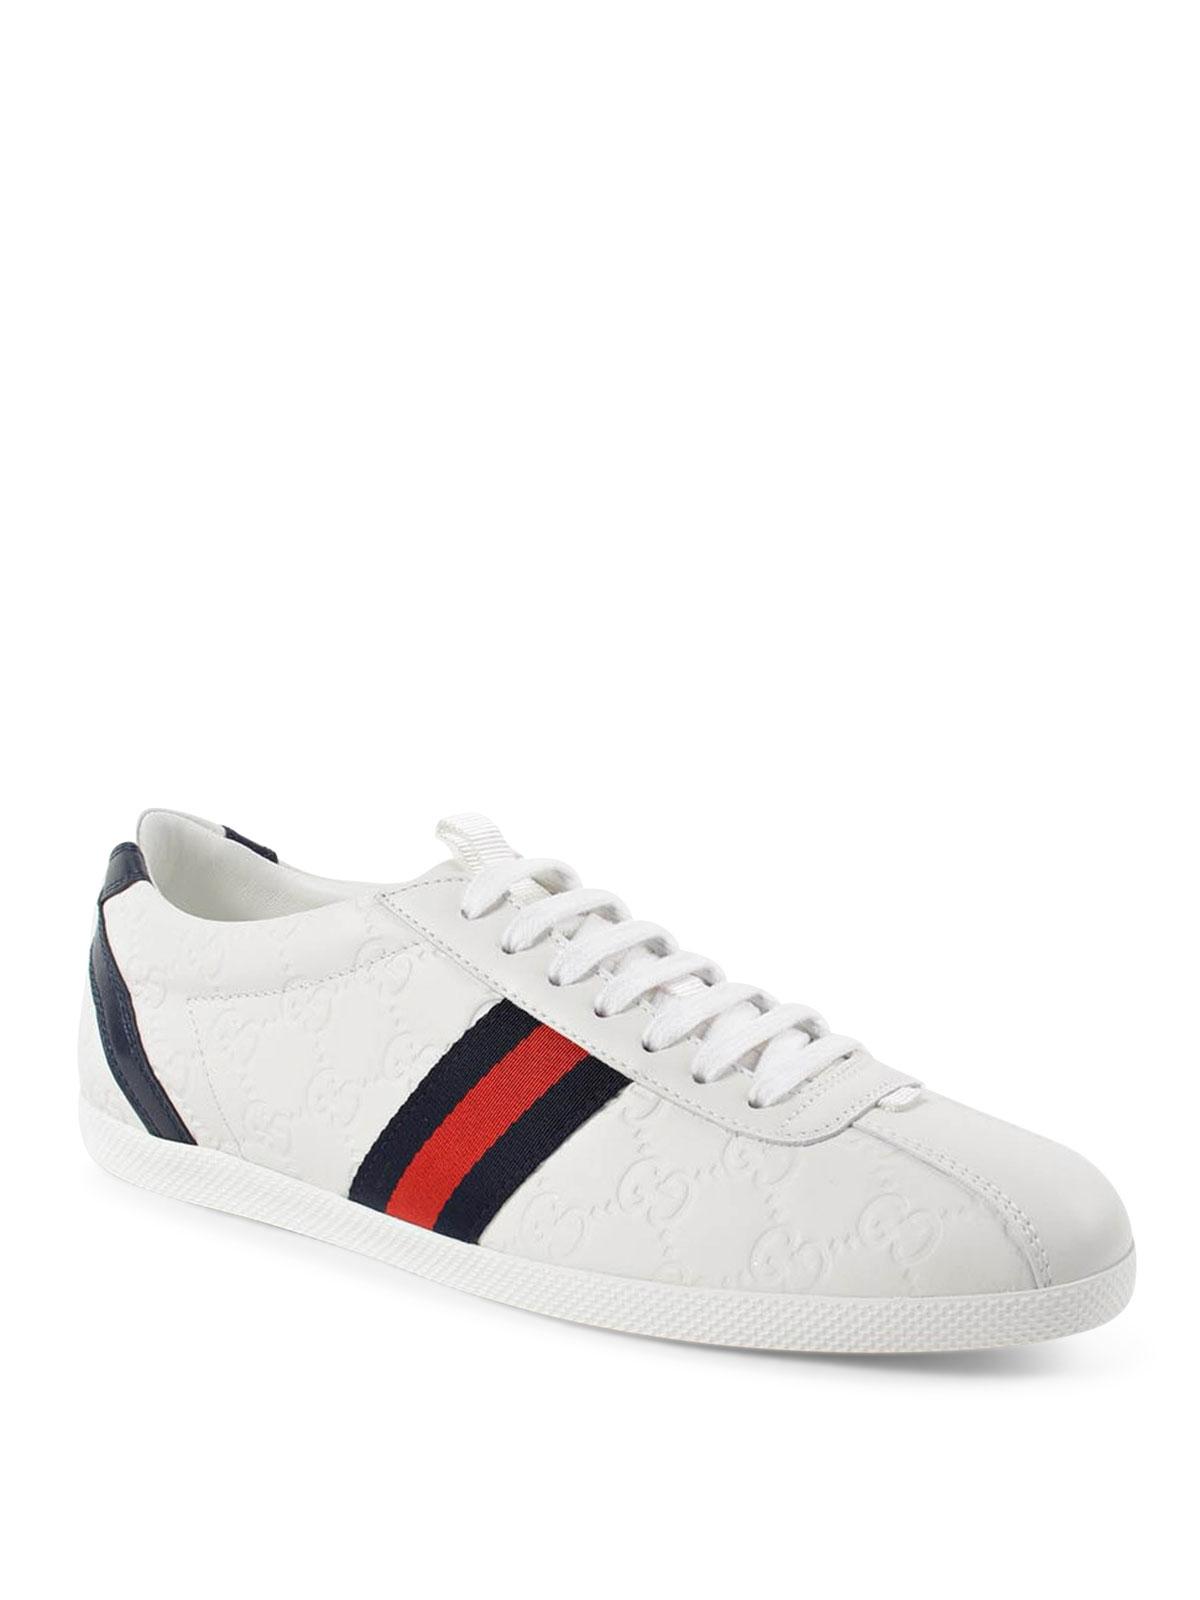 353ccf69a33728 Gucci - Sneaker Fur Damen - Weiß - Sneaker - 408496 AXWL0 9064